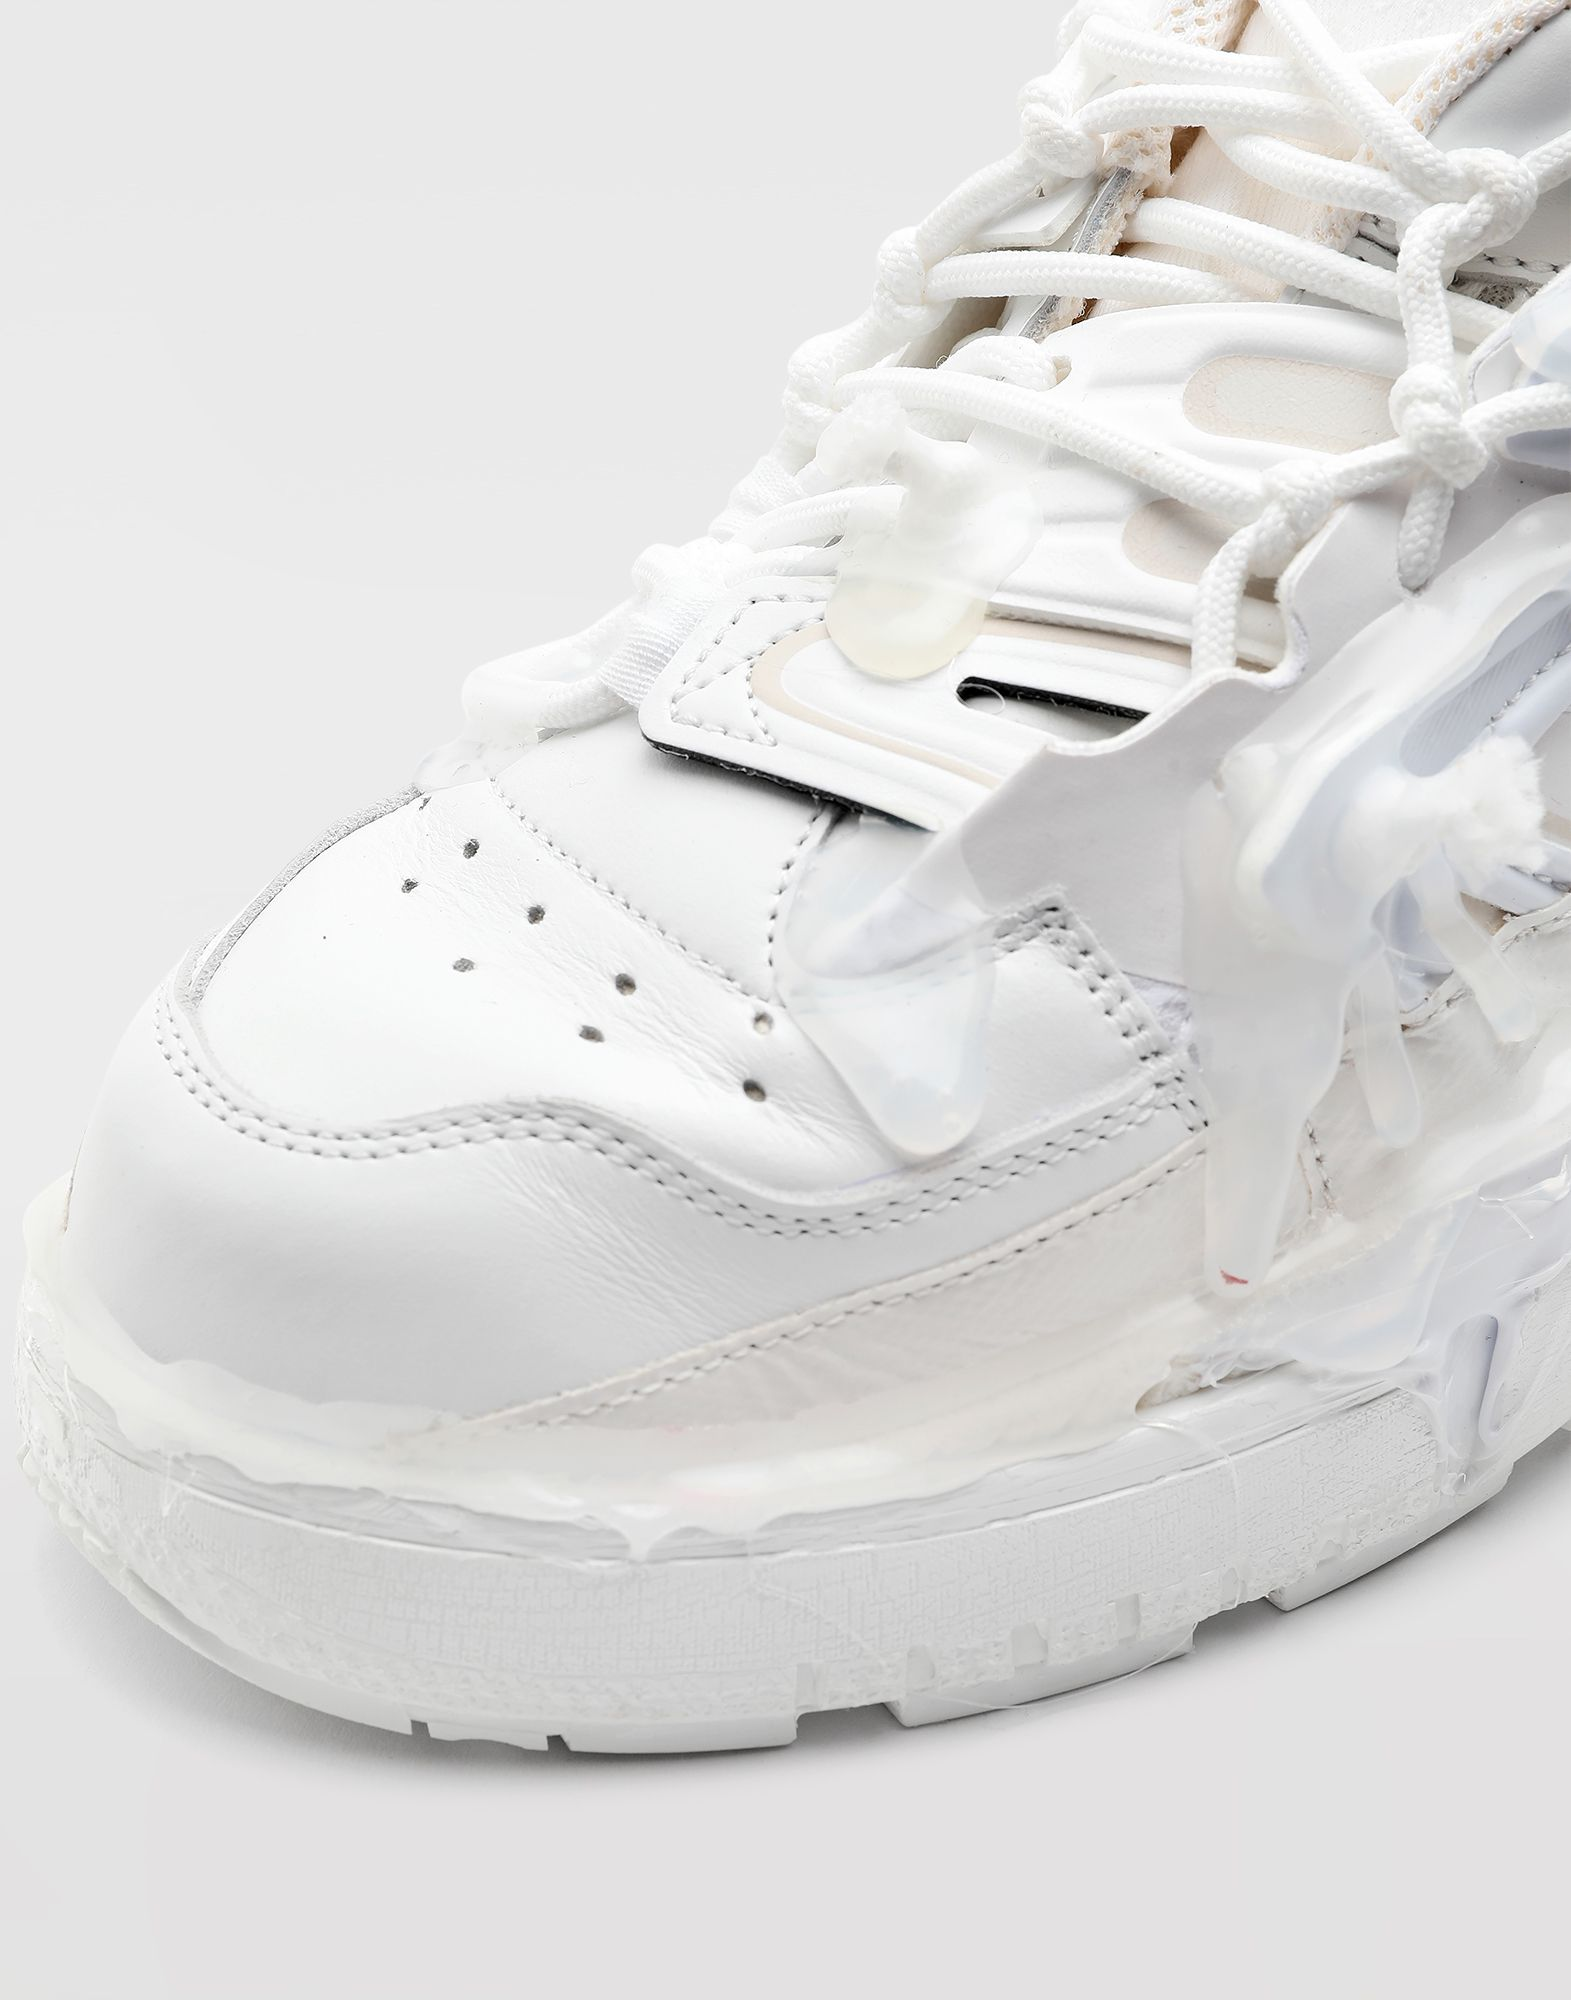 MAISON MARGIELA Fusion sneakers Sneakers Woman a